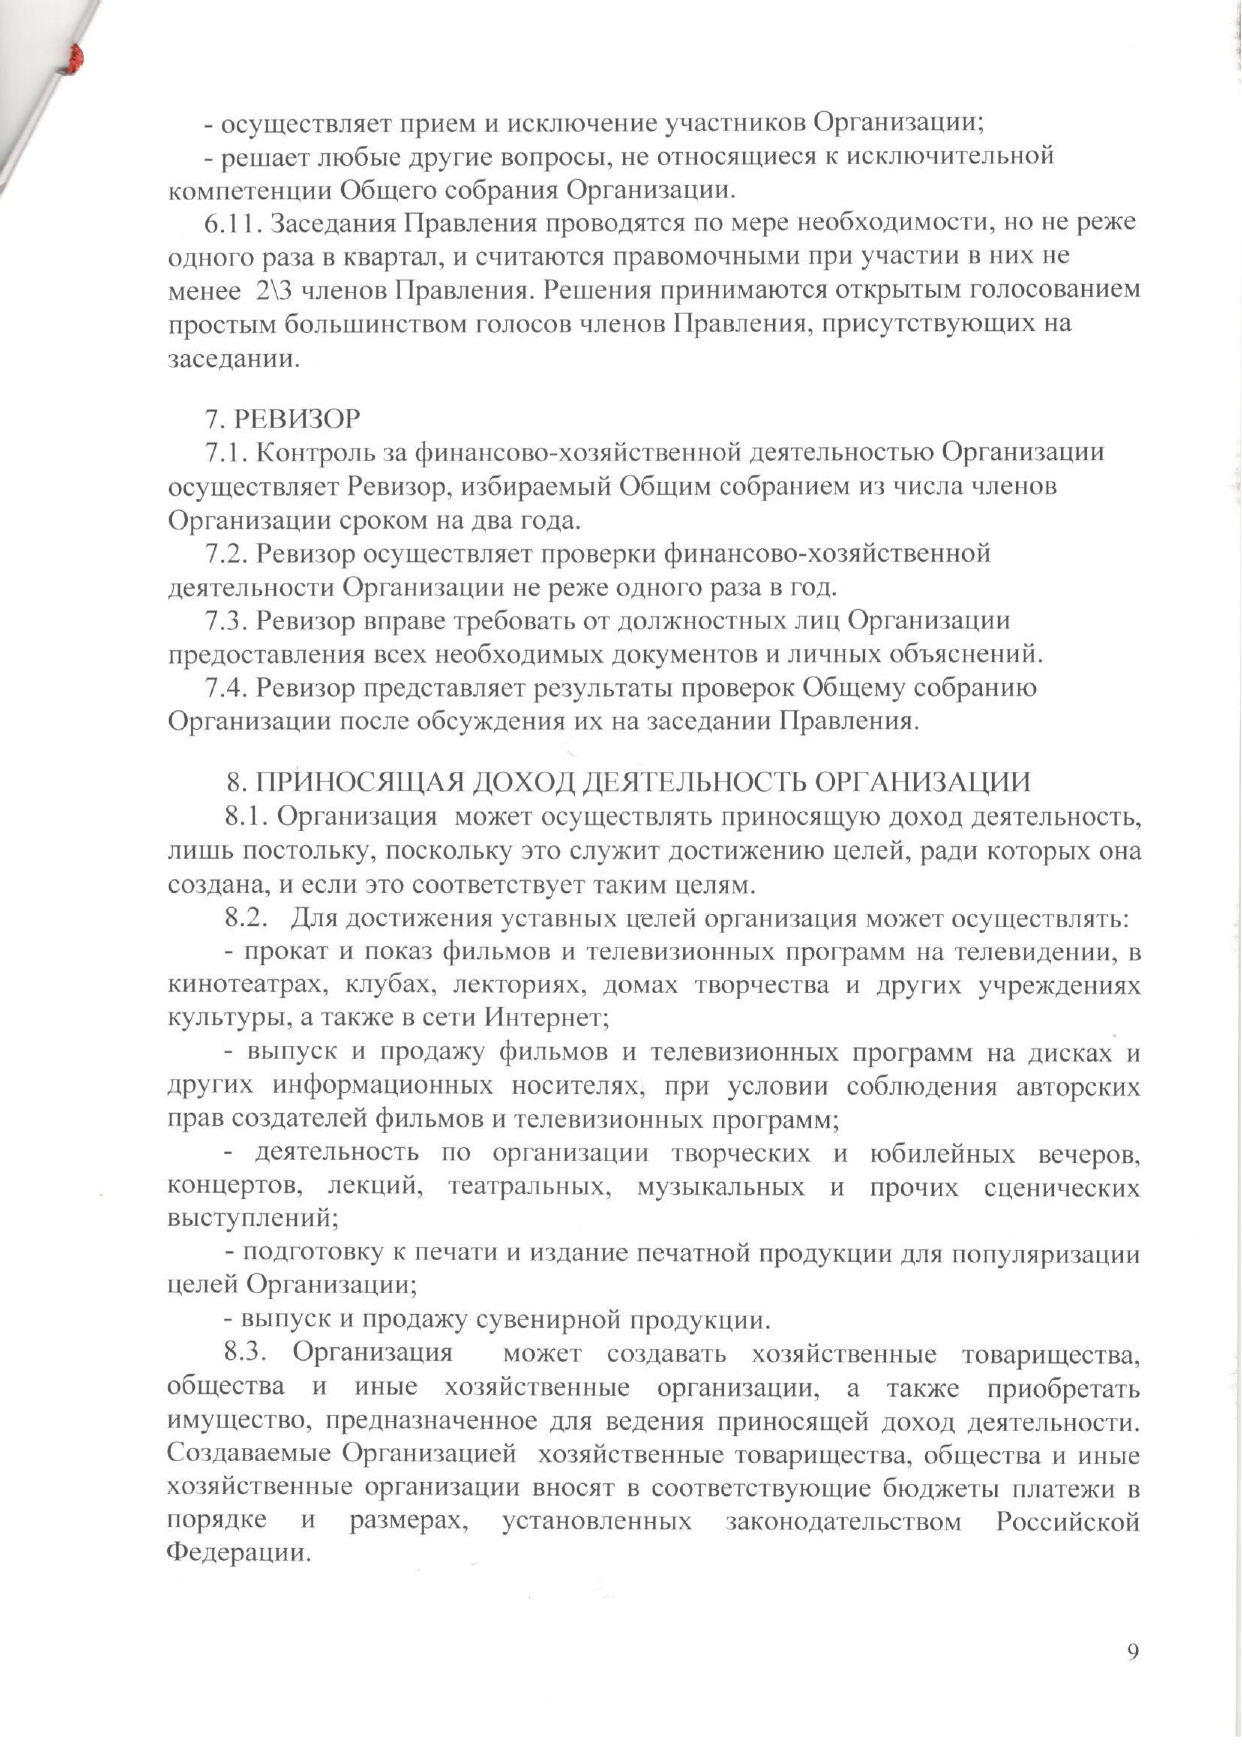 Устав_pages-to-jpg-0009